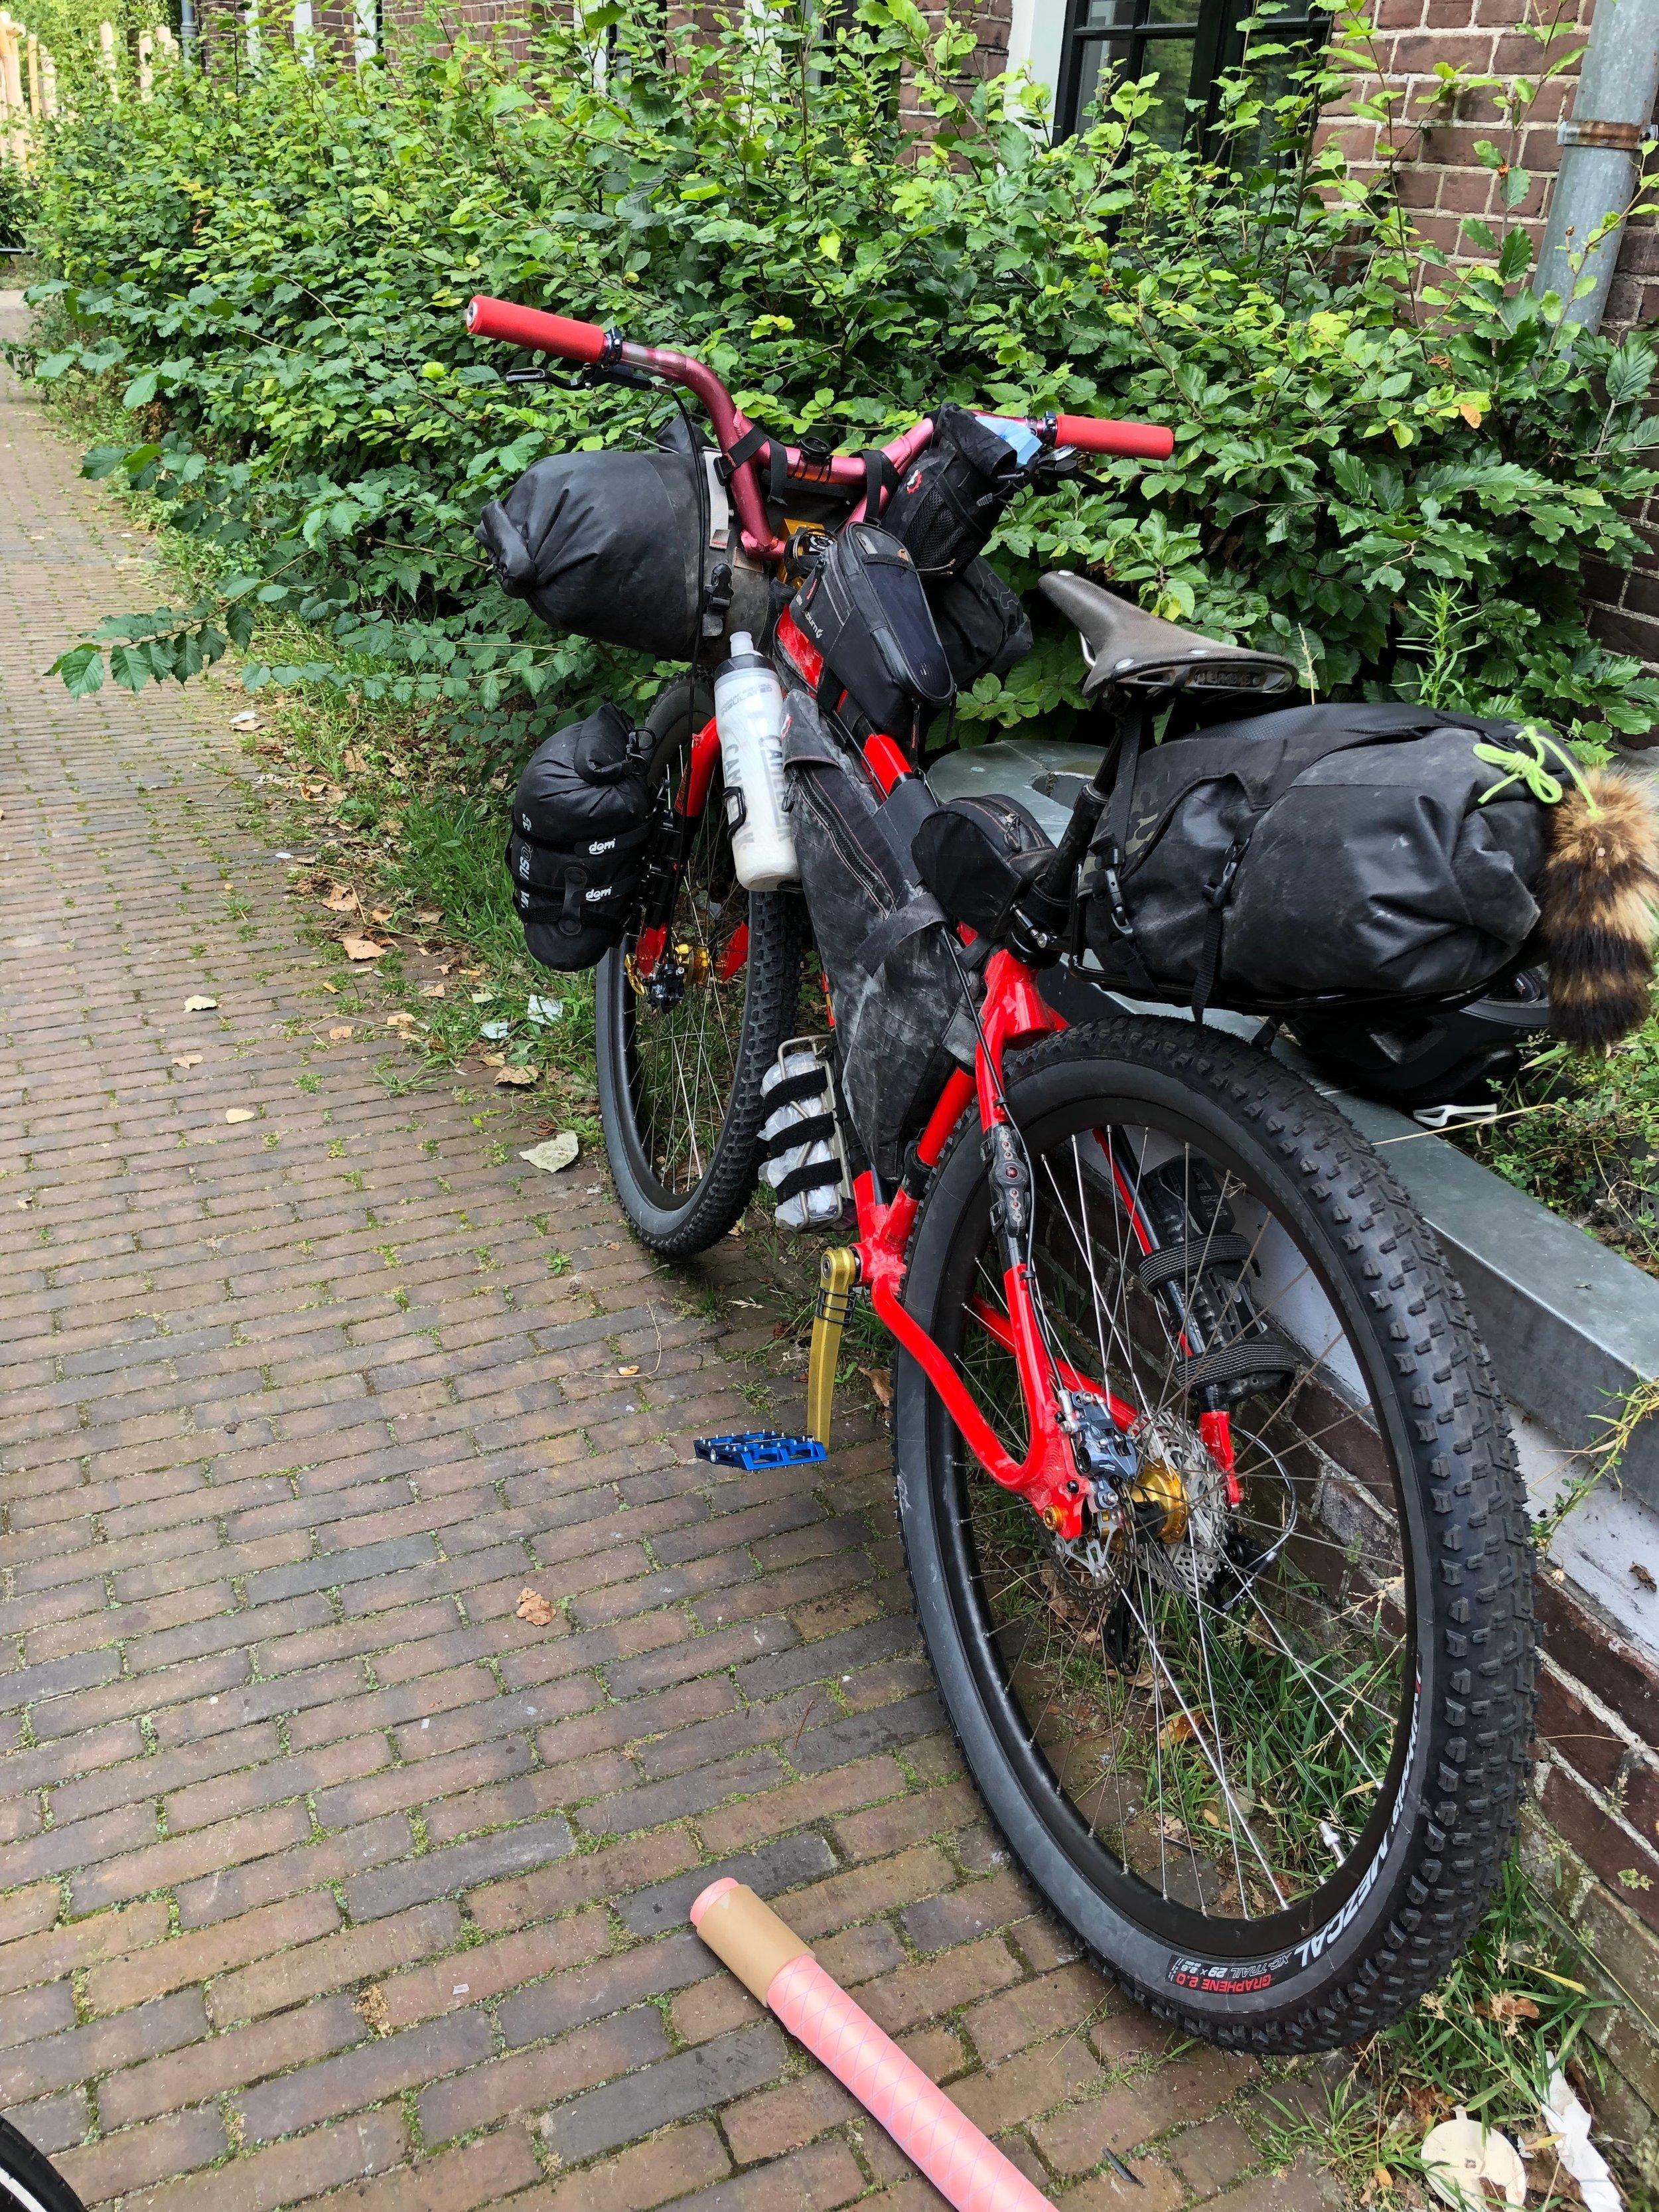 Aaron's Bikepacking Rig